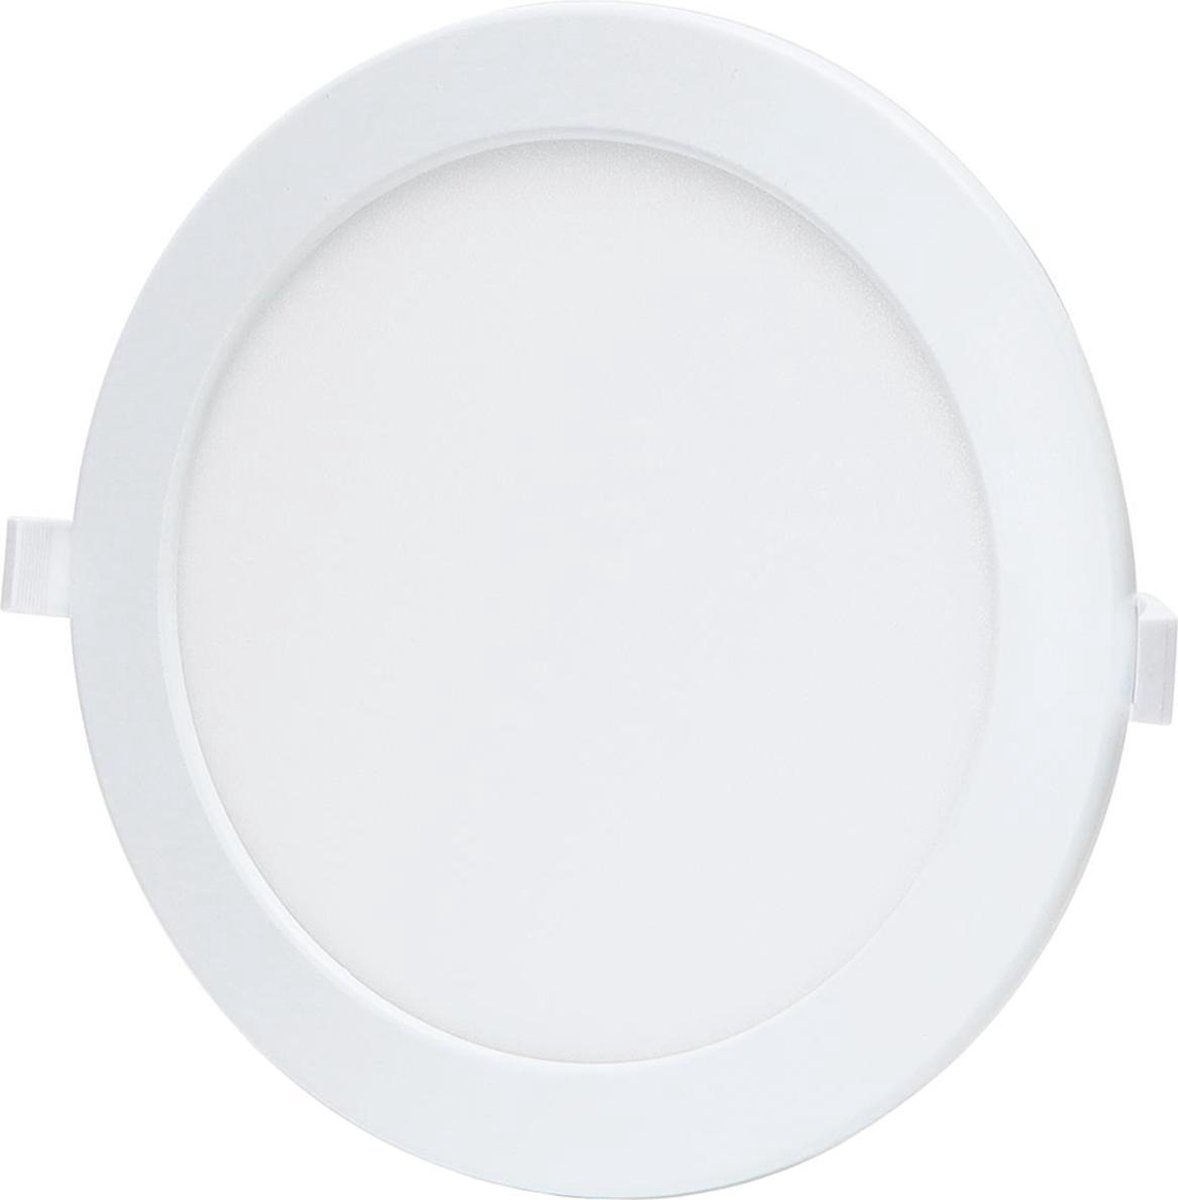 LED Downlight - Smart LED - Aigi Zumba - 18W - Aanpasbare Kleur - Inbouw Rond - Mat Wit - Aluminium - Ø220mm - BSE